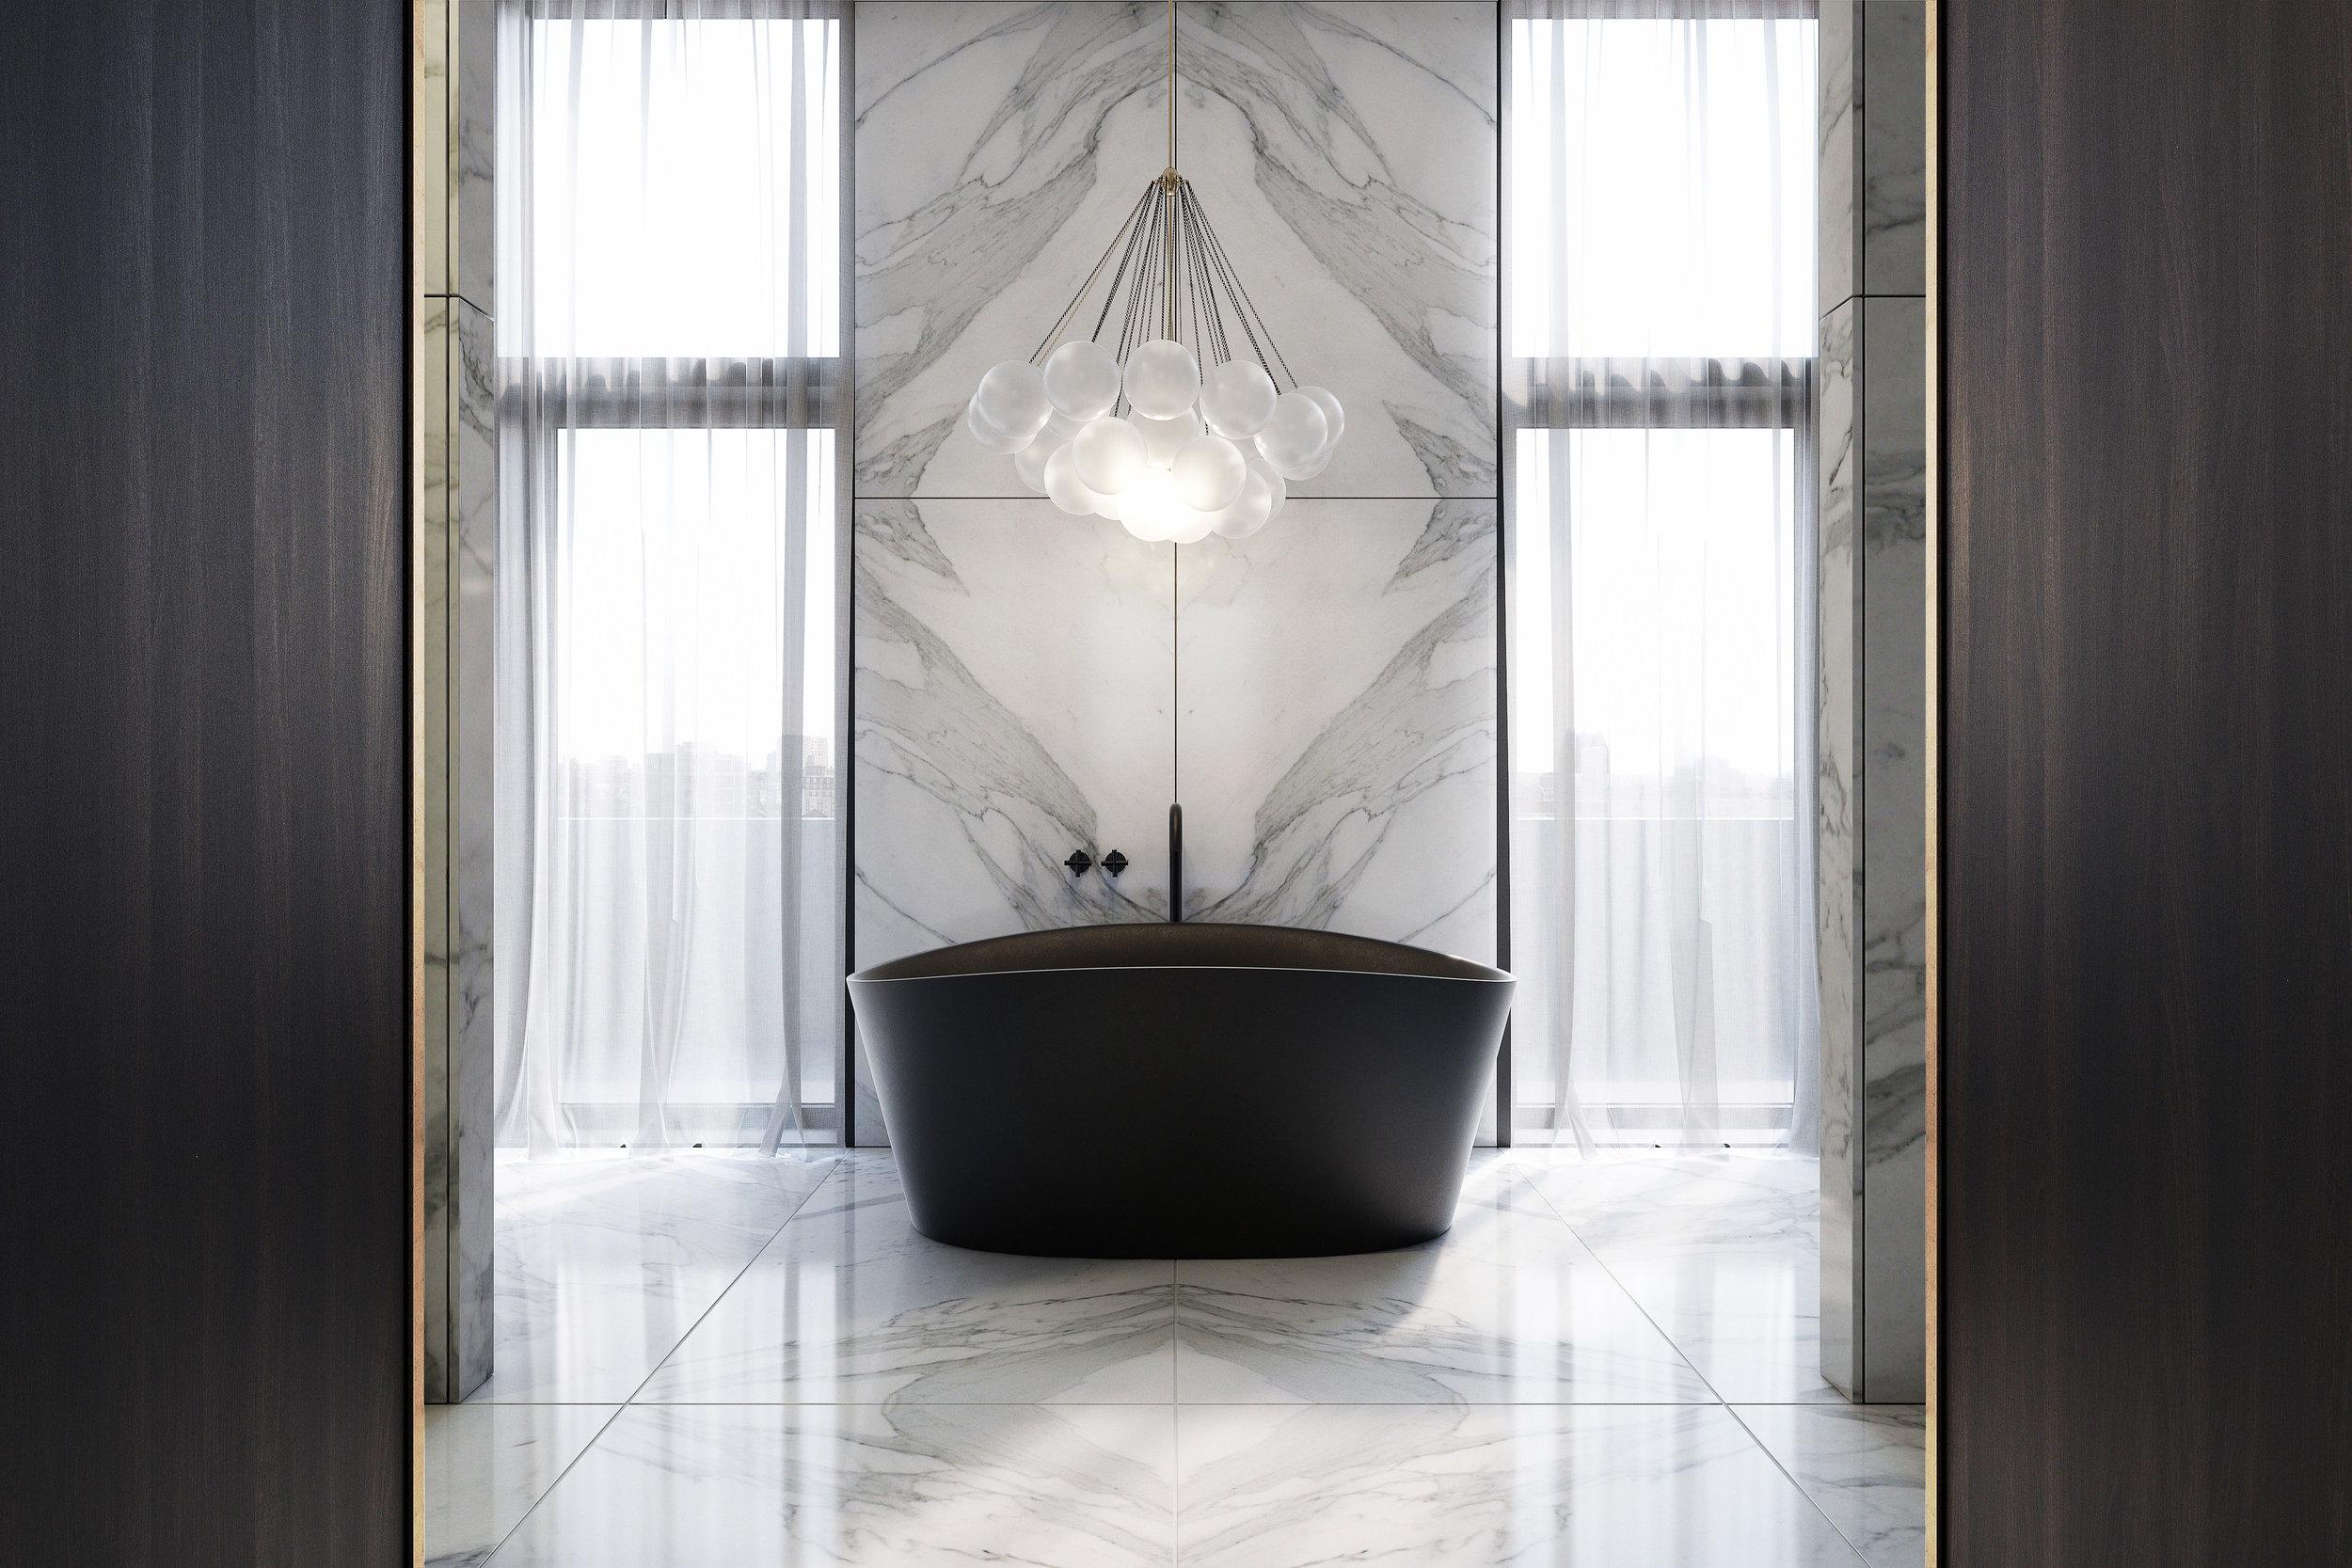 60 St Johns Wood penthouse bathroom CGI